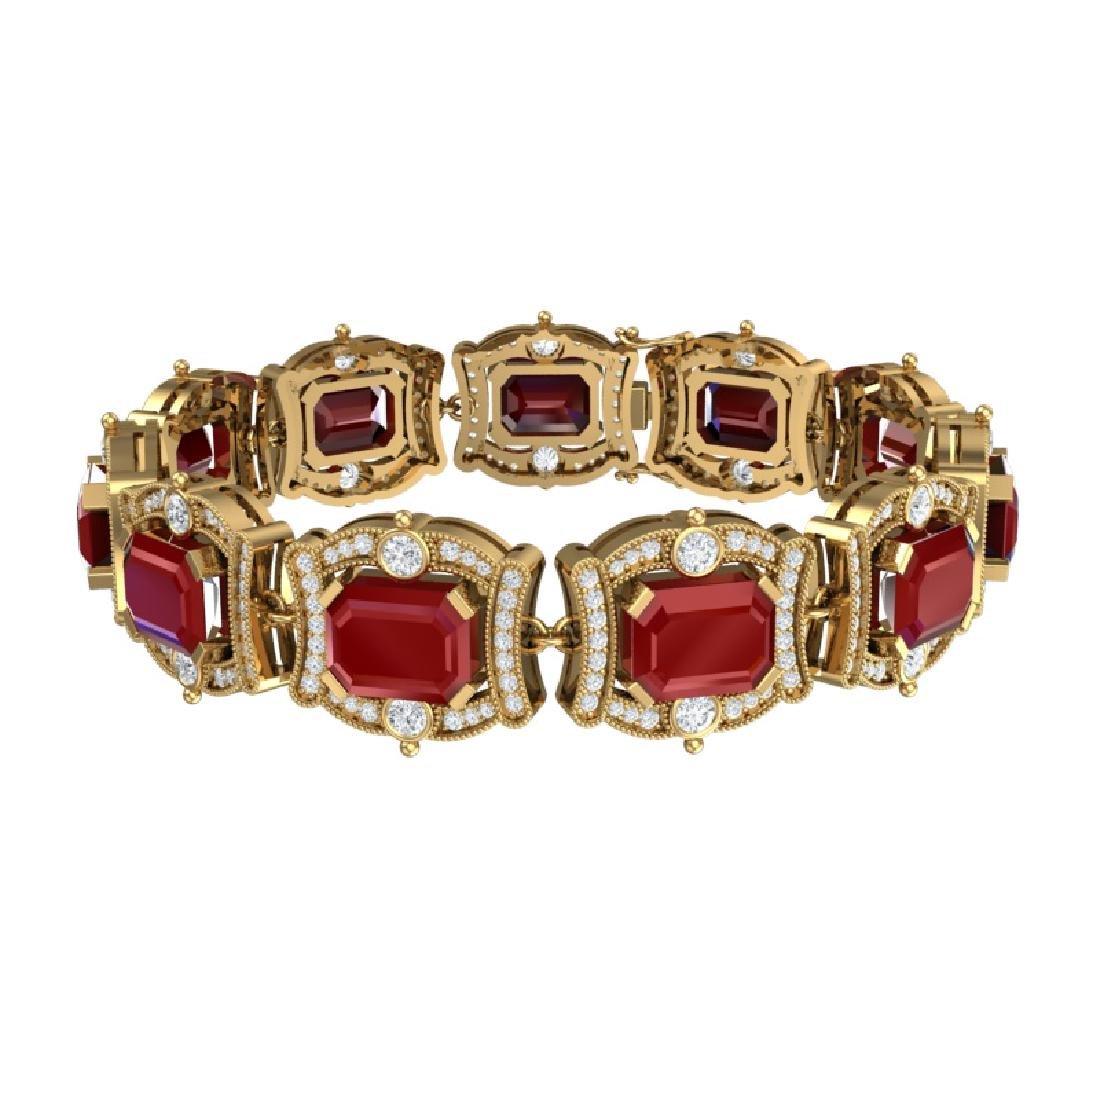 43.87 CTW Royalty Ruby & VS Diamond Bracelet 18K Yellow - 3